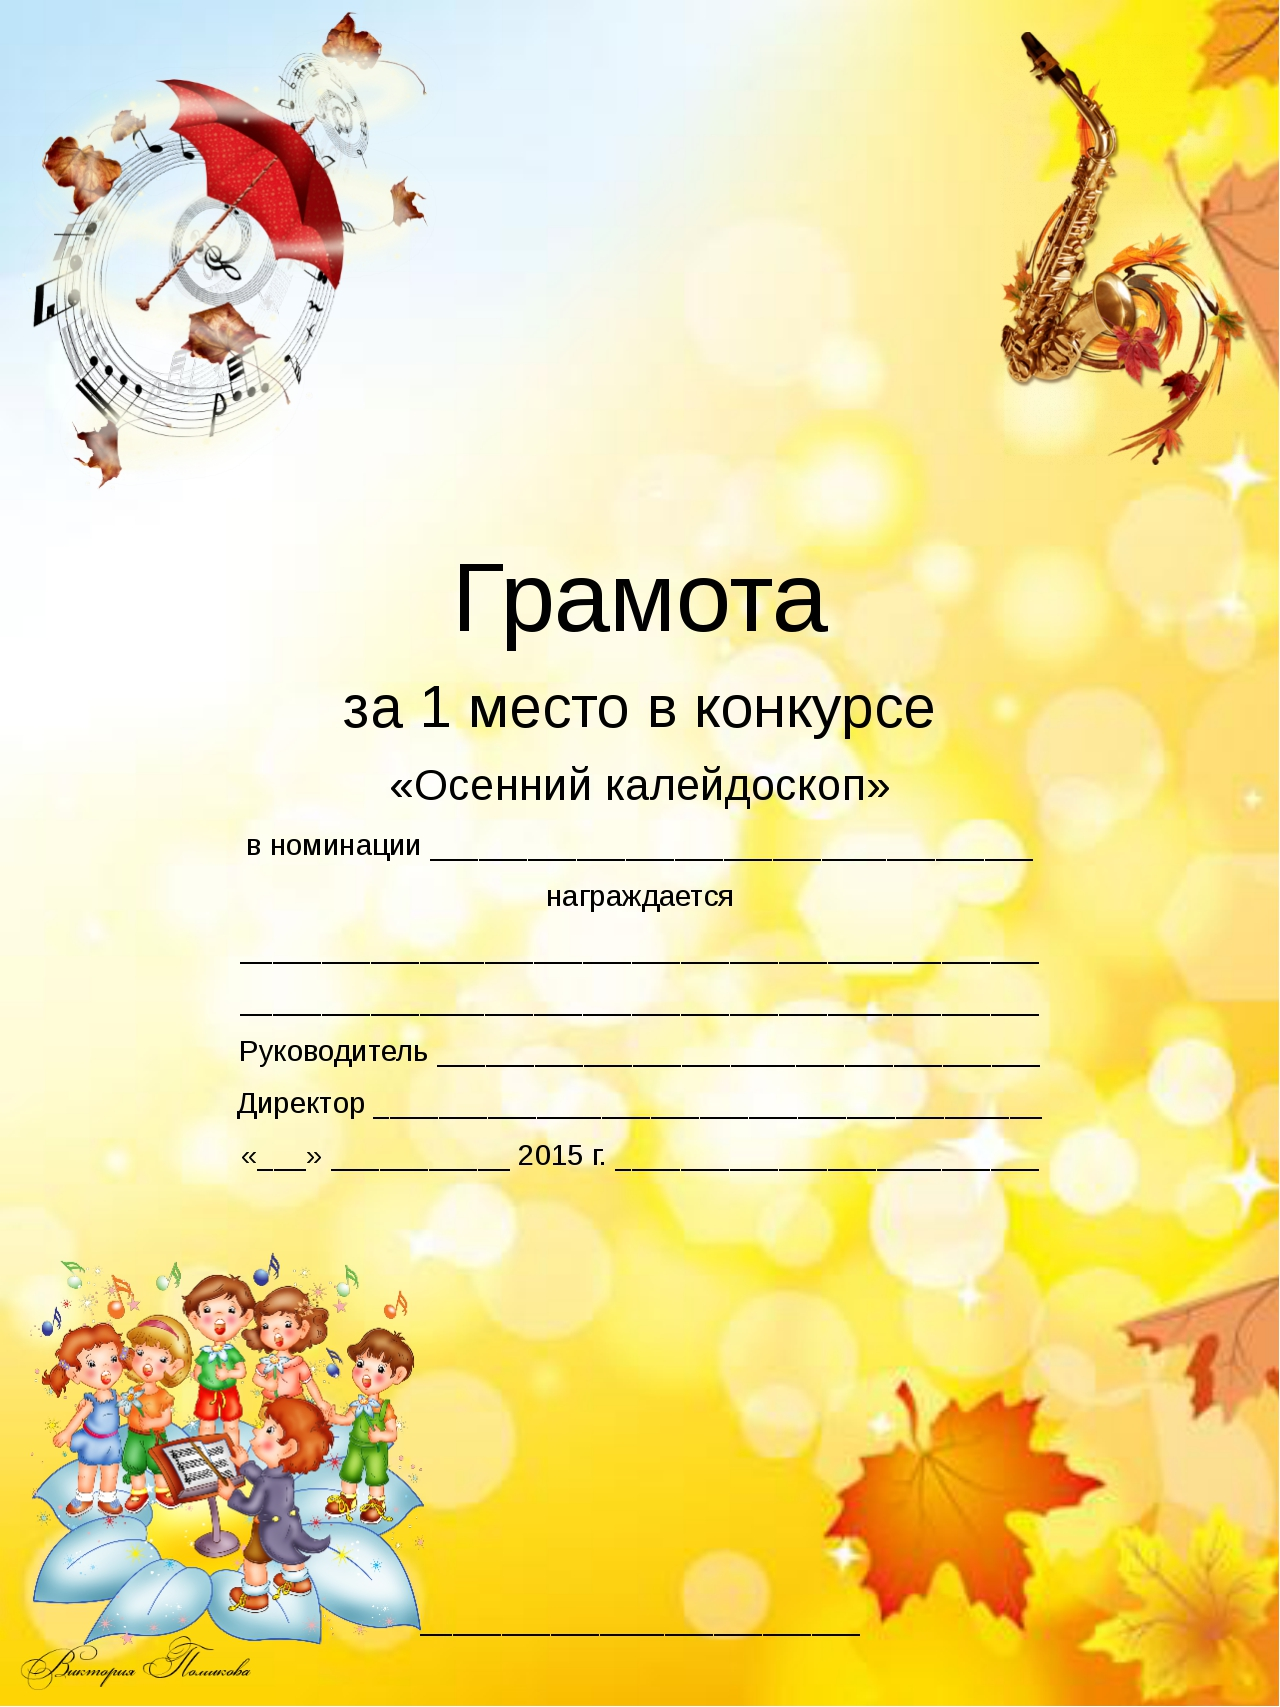 Грамота за 1 место в конкурсе «Осенний калейдоскоп» в номинации _____________...